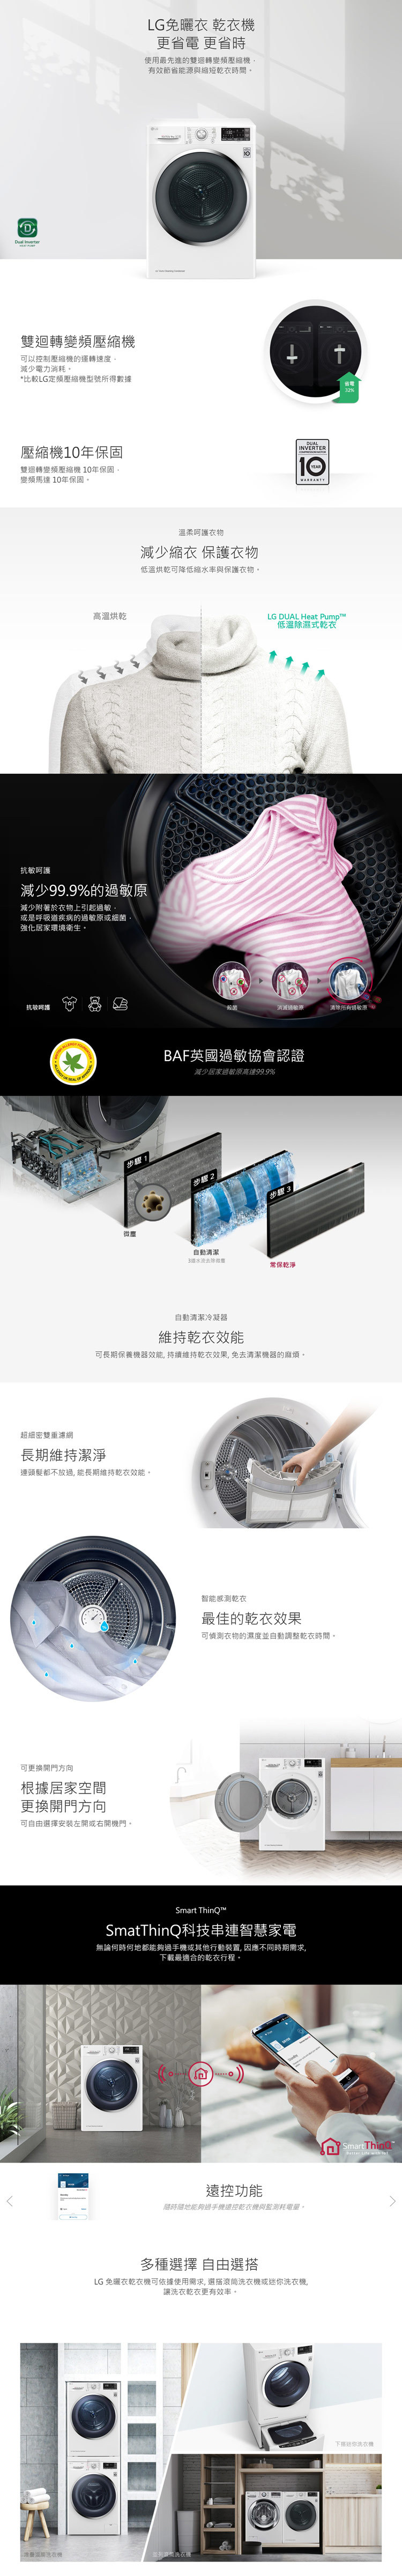 LG 樂金 WR-90TW 乾衣機 9kg 抗敏呵護 自動清潔冷凝器